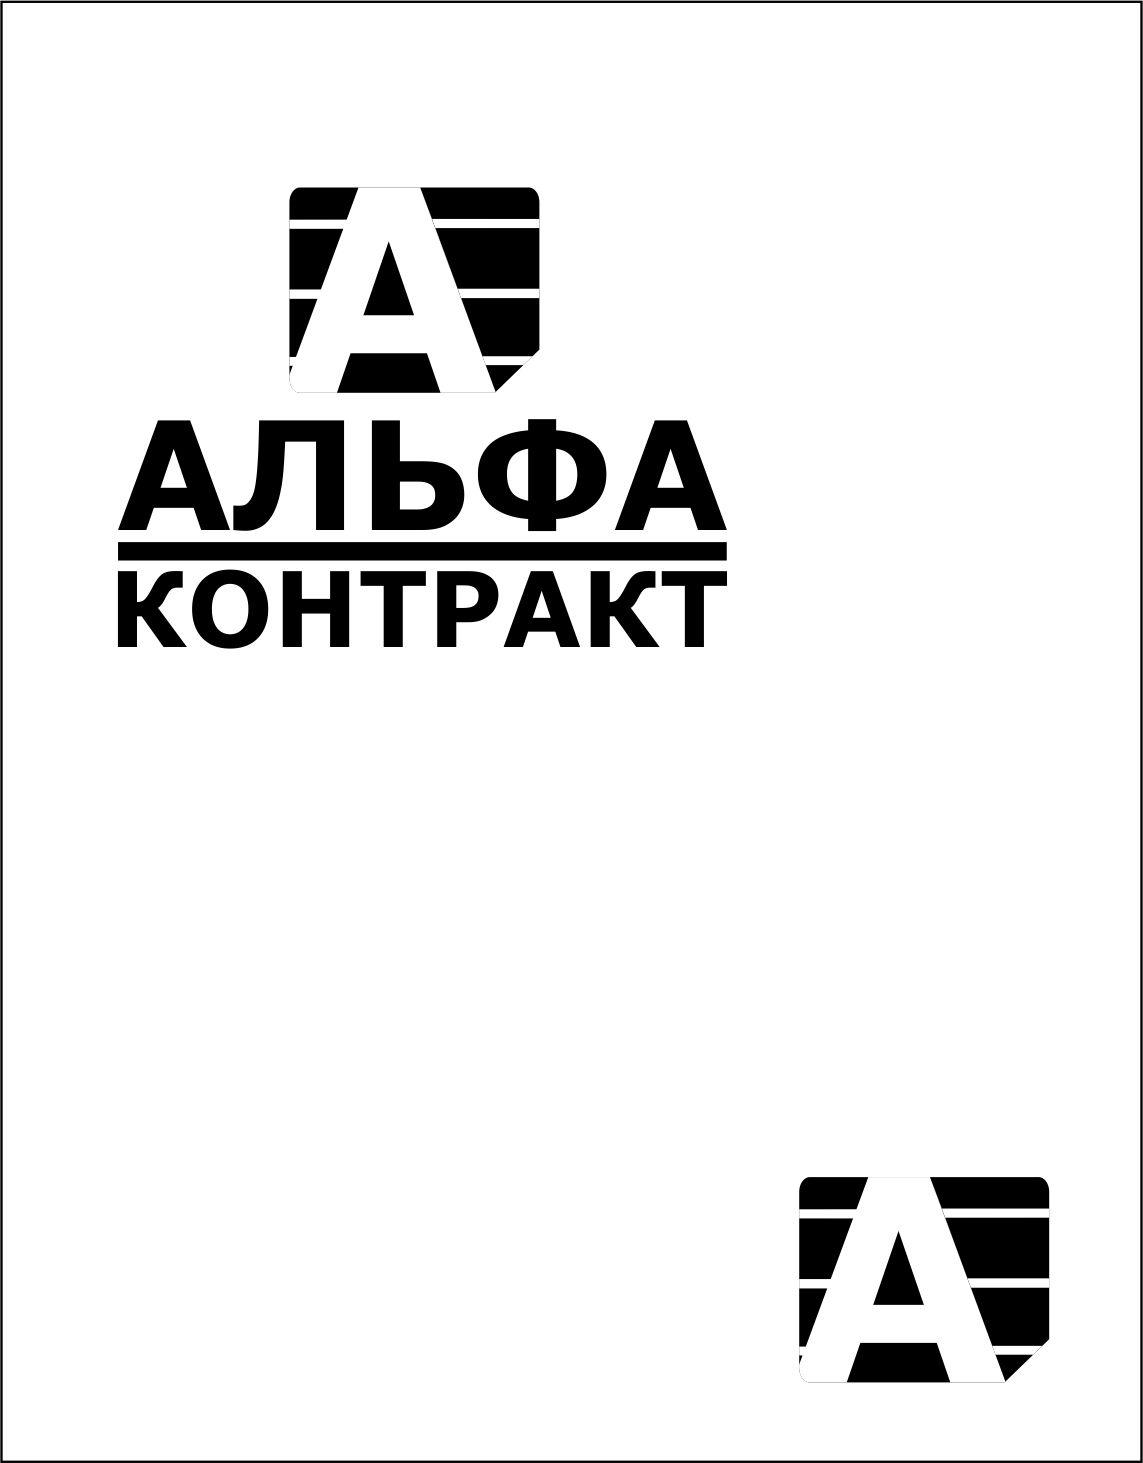 Дизайнер для разработки логотипа компании фото f_2555bf7d9085c56b.jpg